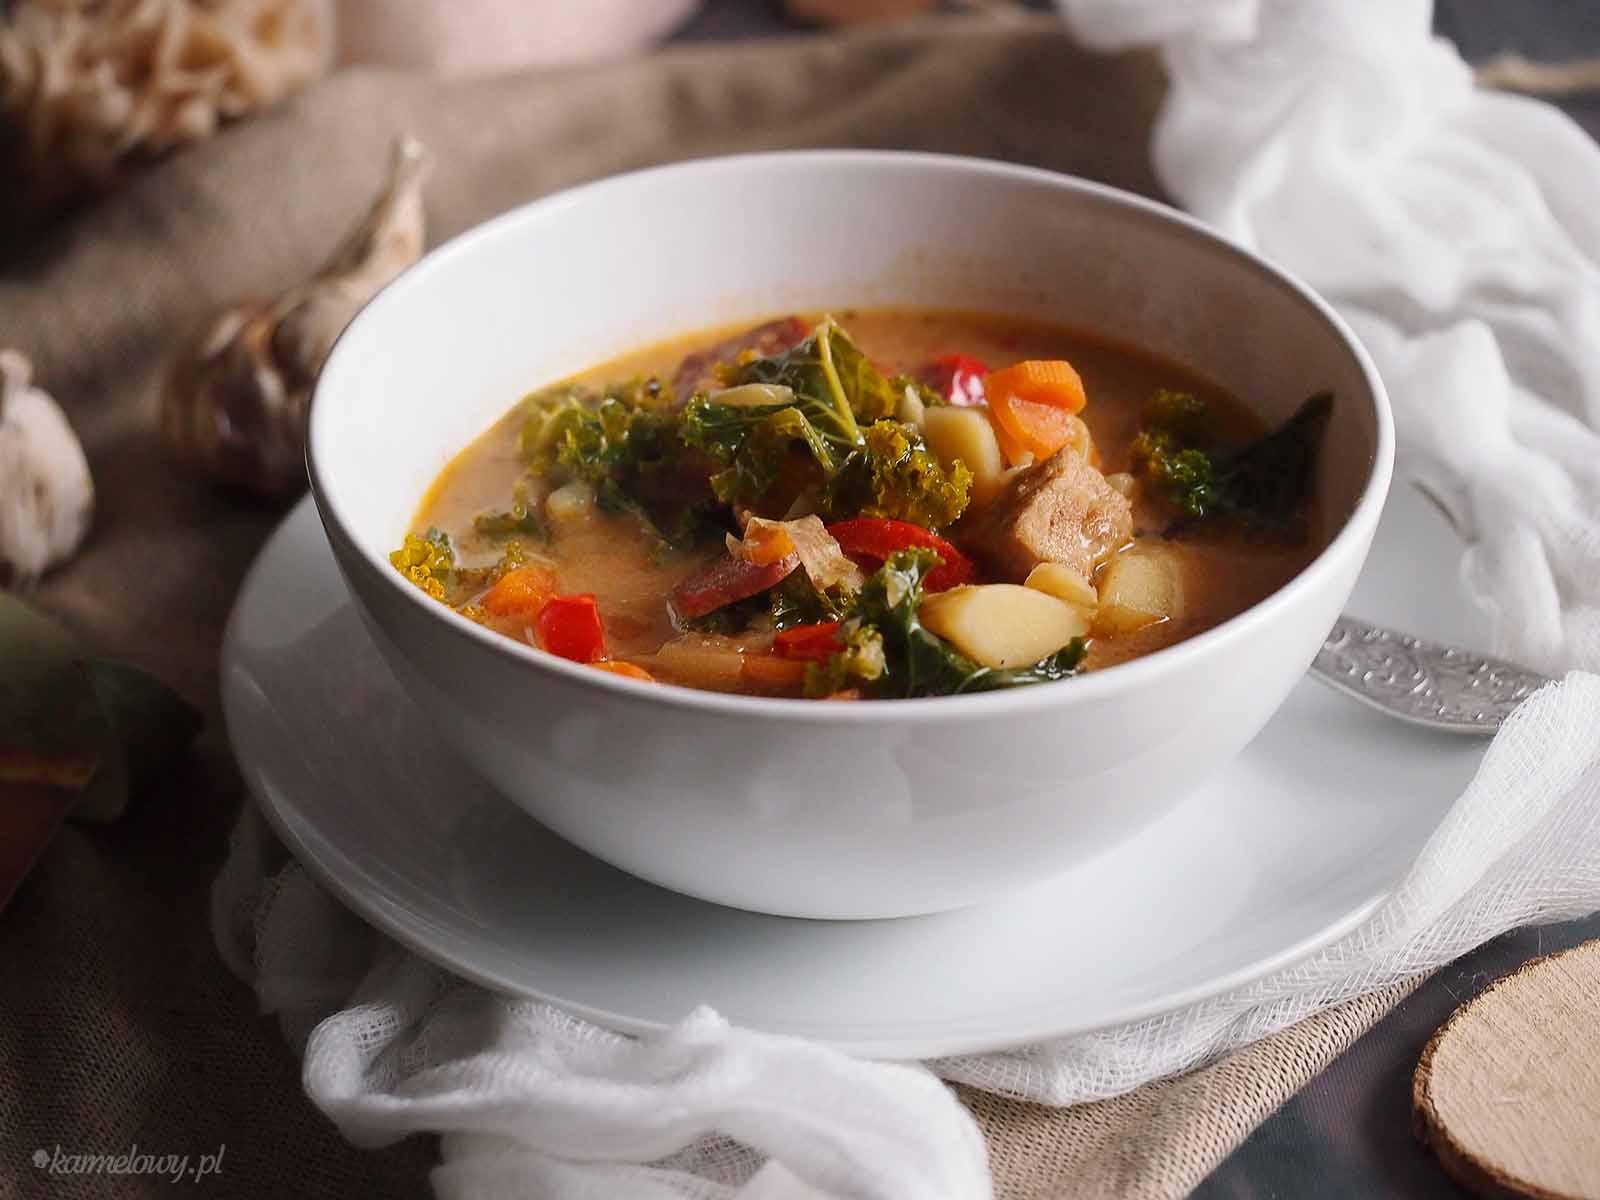 Zupa-miesna-z-jarmuzem-Meaty-soup-with-kale